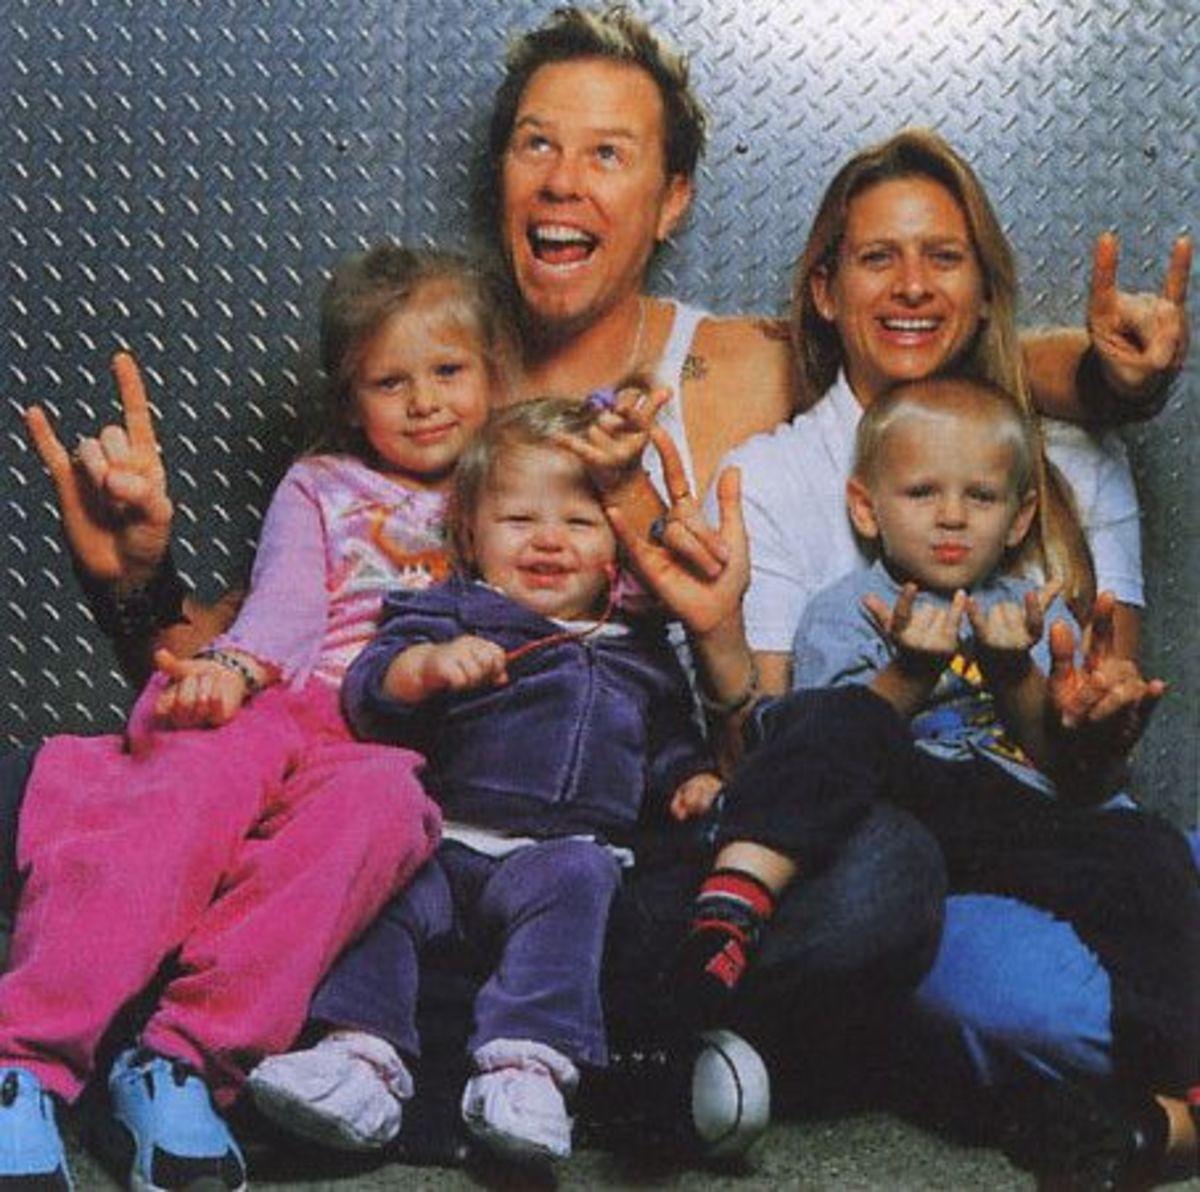 Lars ulrich kids